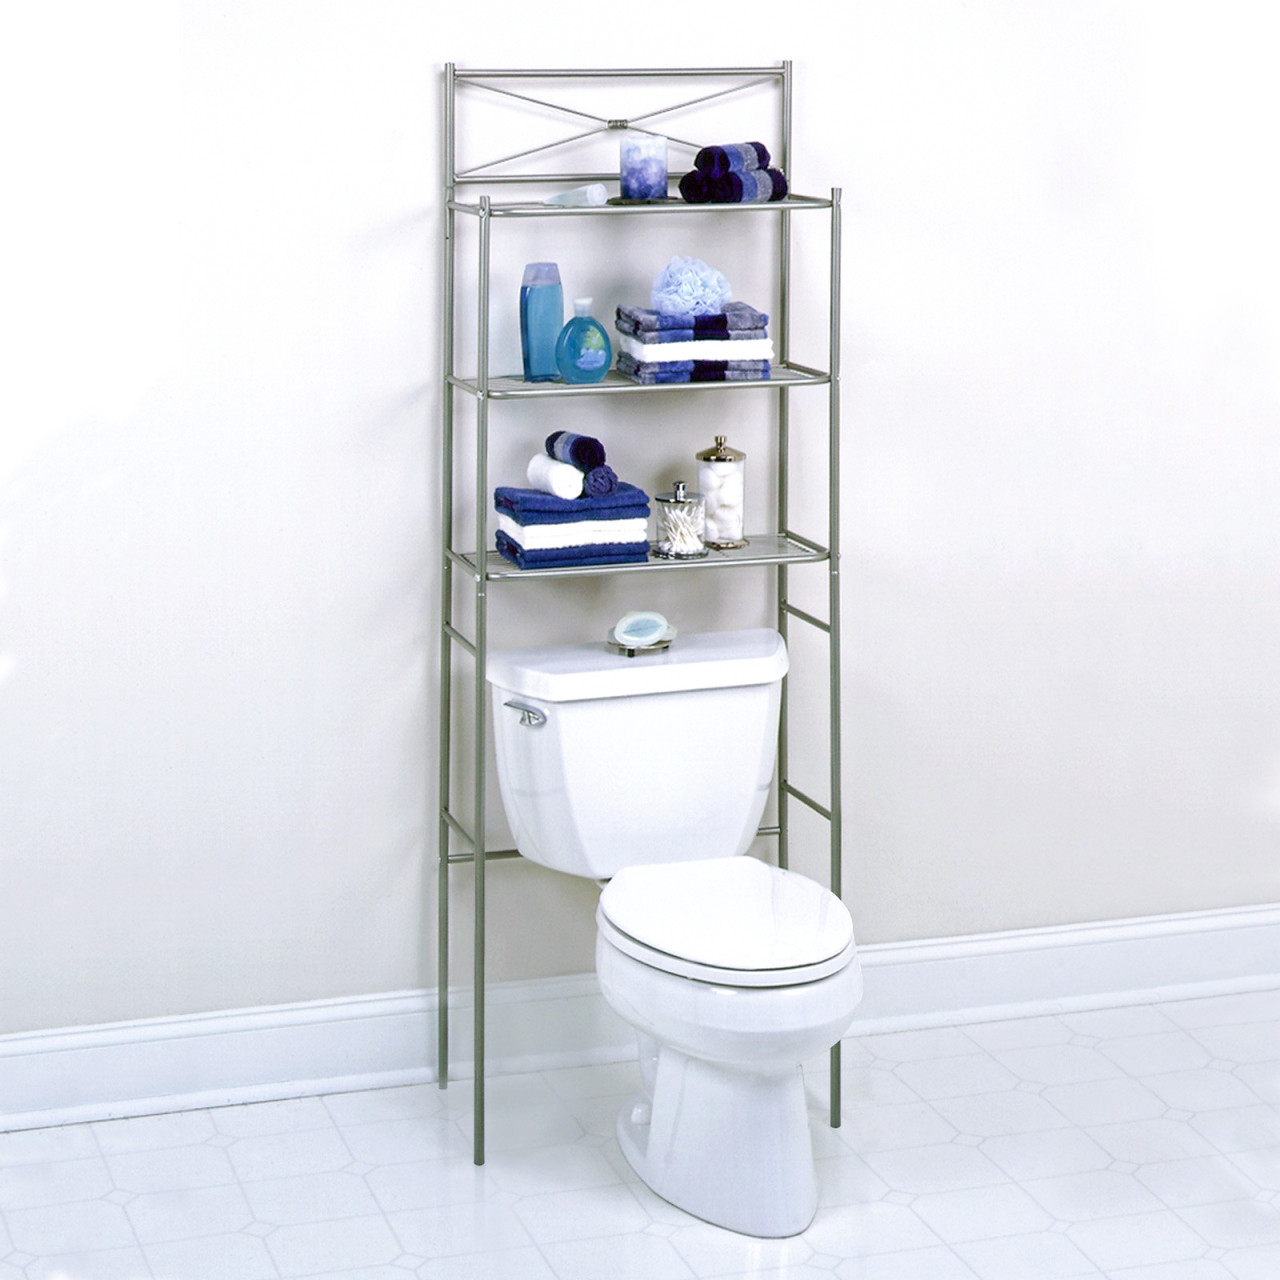 3 Shelf Over Toilet Bathroom Space Saver Towel Storage Rack